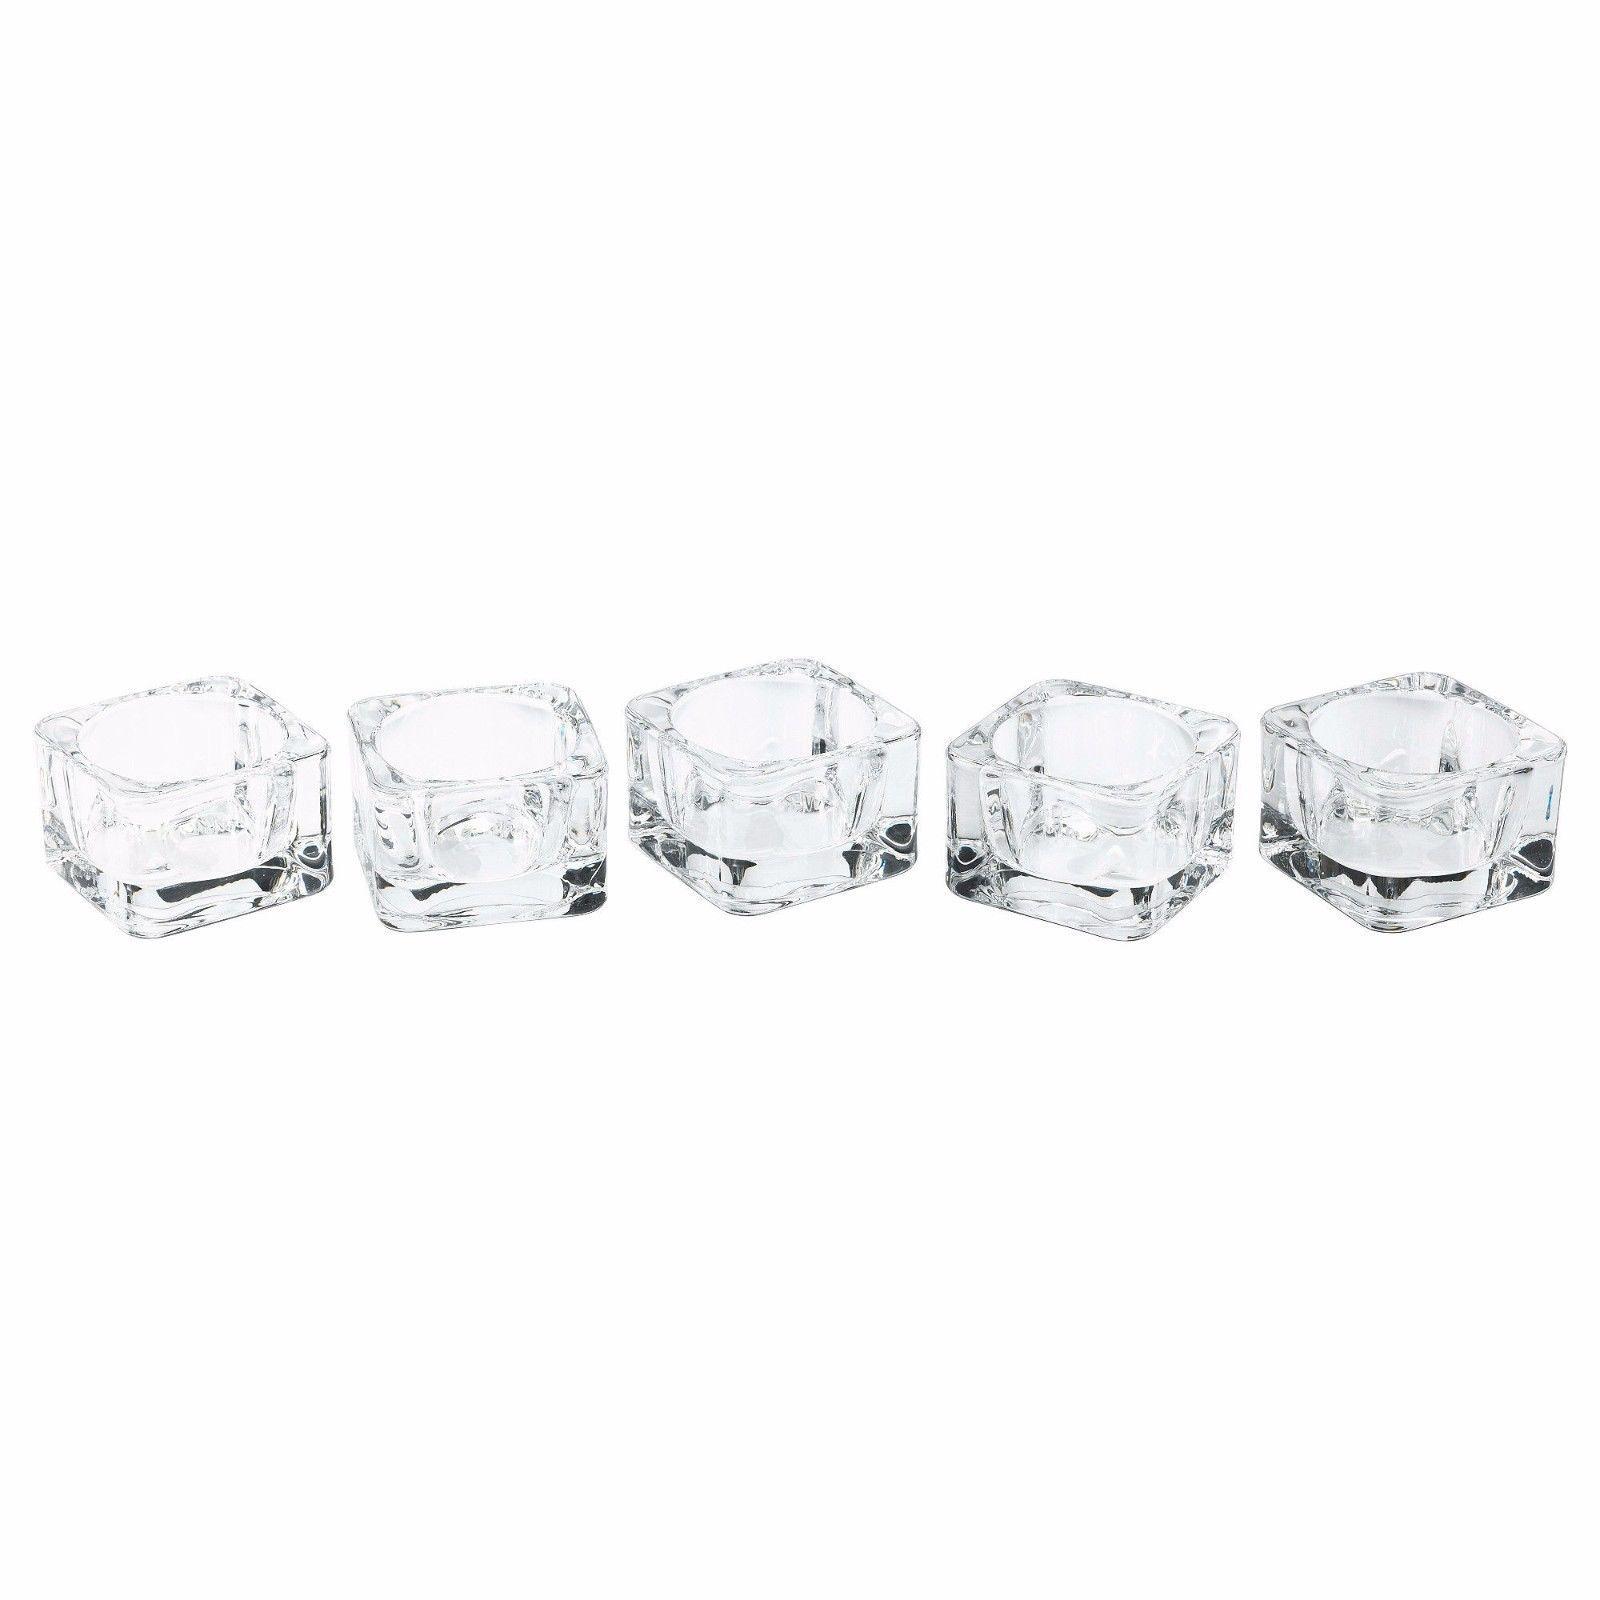 Glasig tealight holder glass rounded corner pack of candle holders